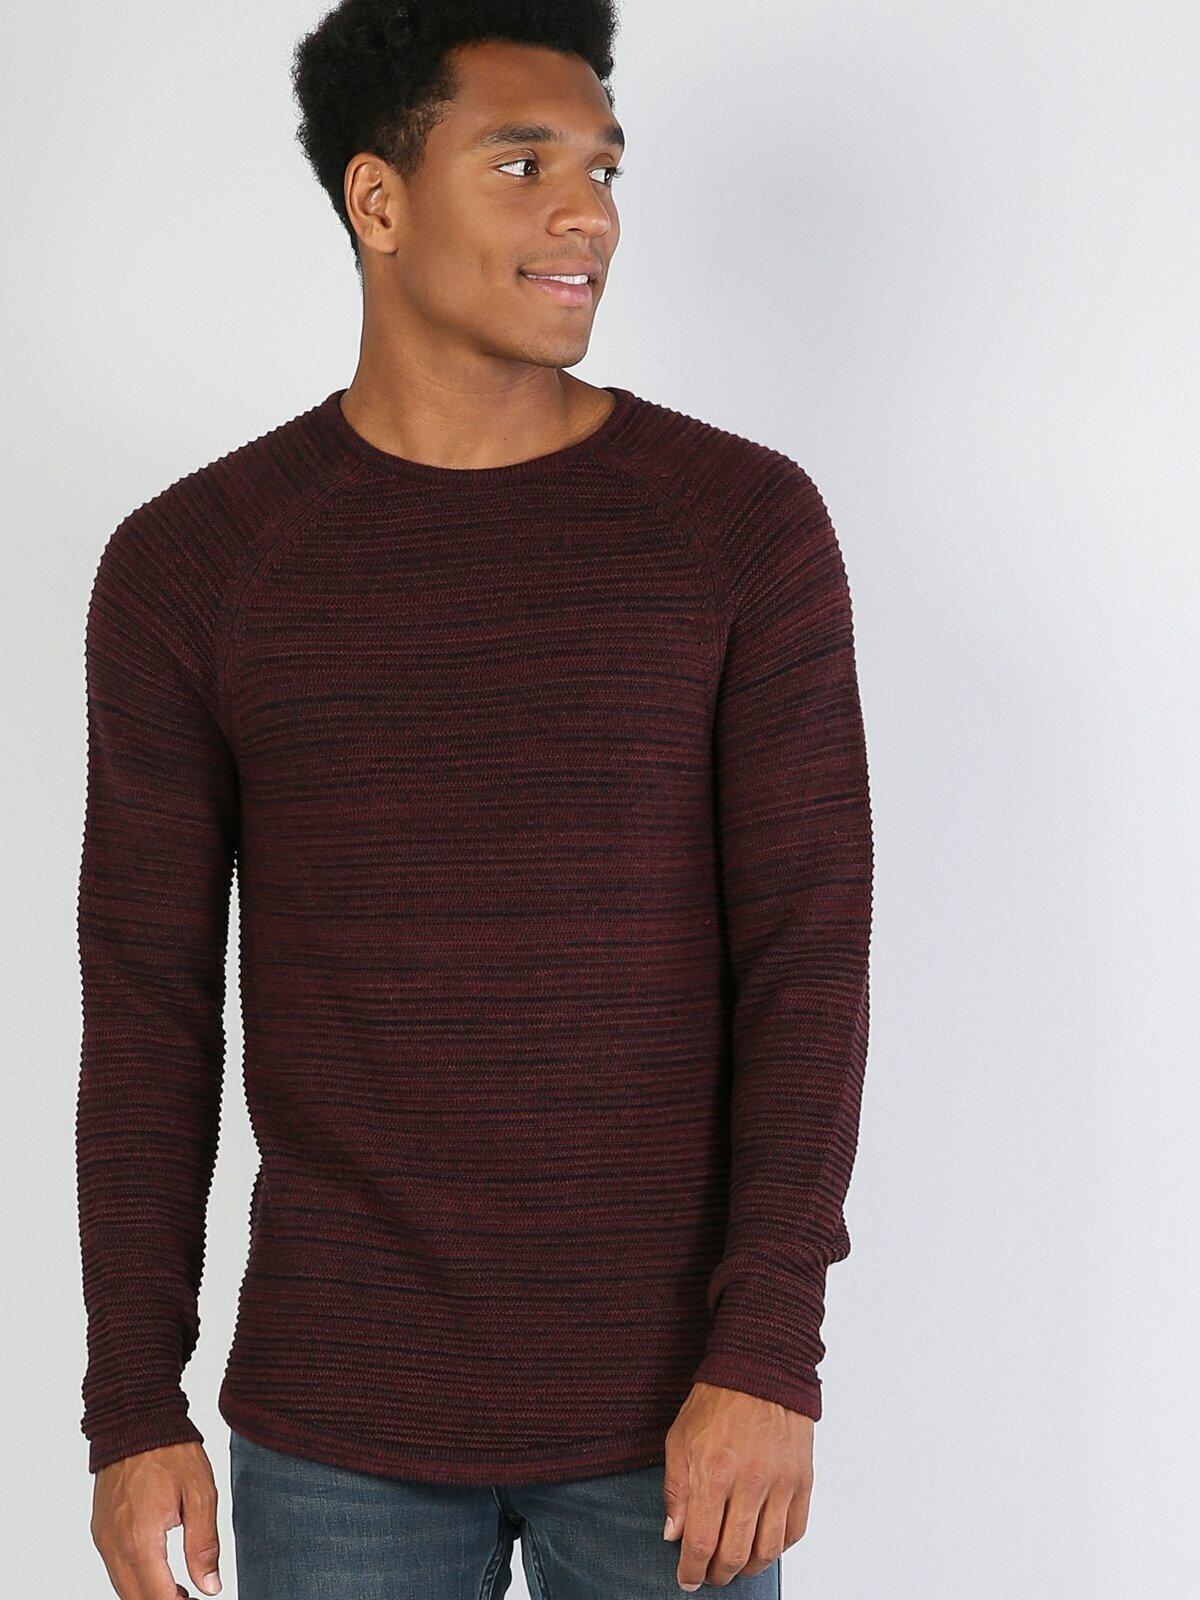 Colins Men Slim Fit Purple Sweaters Men's sweater fashion sweater outerwear,CL1035766